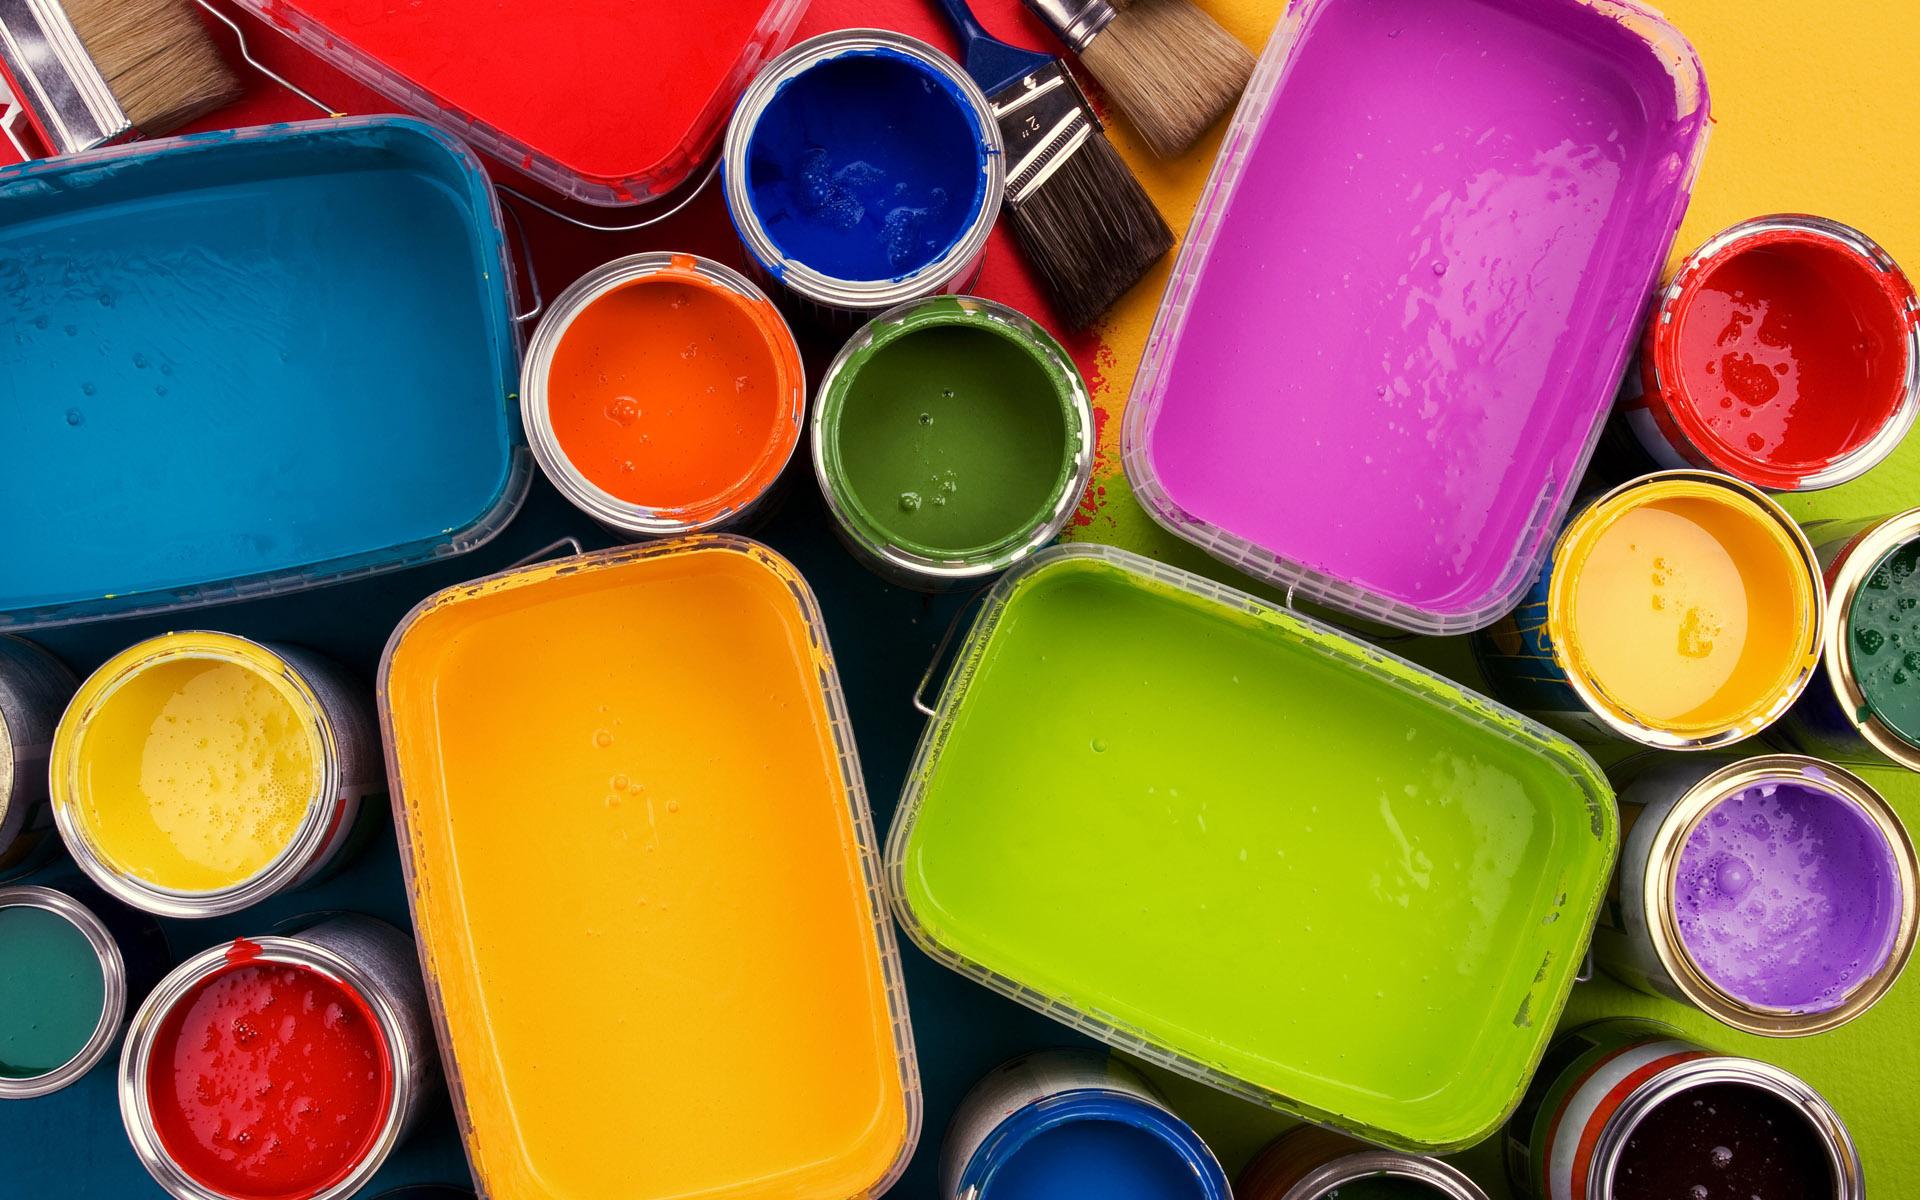 Hd wallpaper colorful - Download Colors Hd Wallpaper